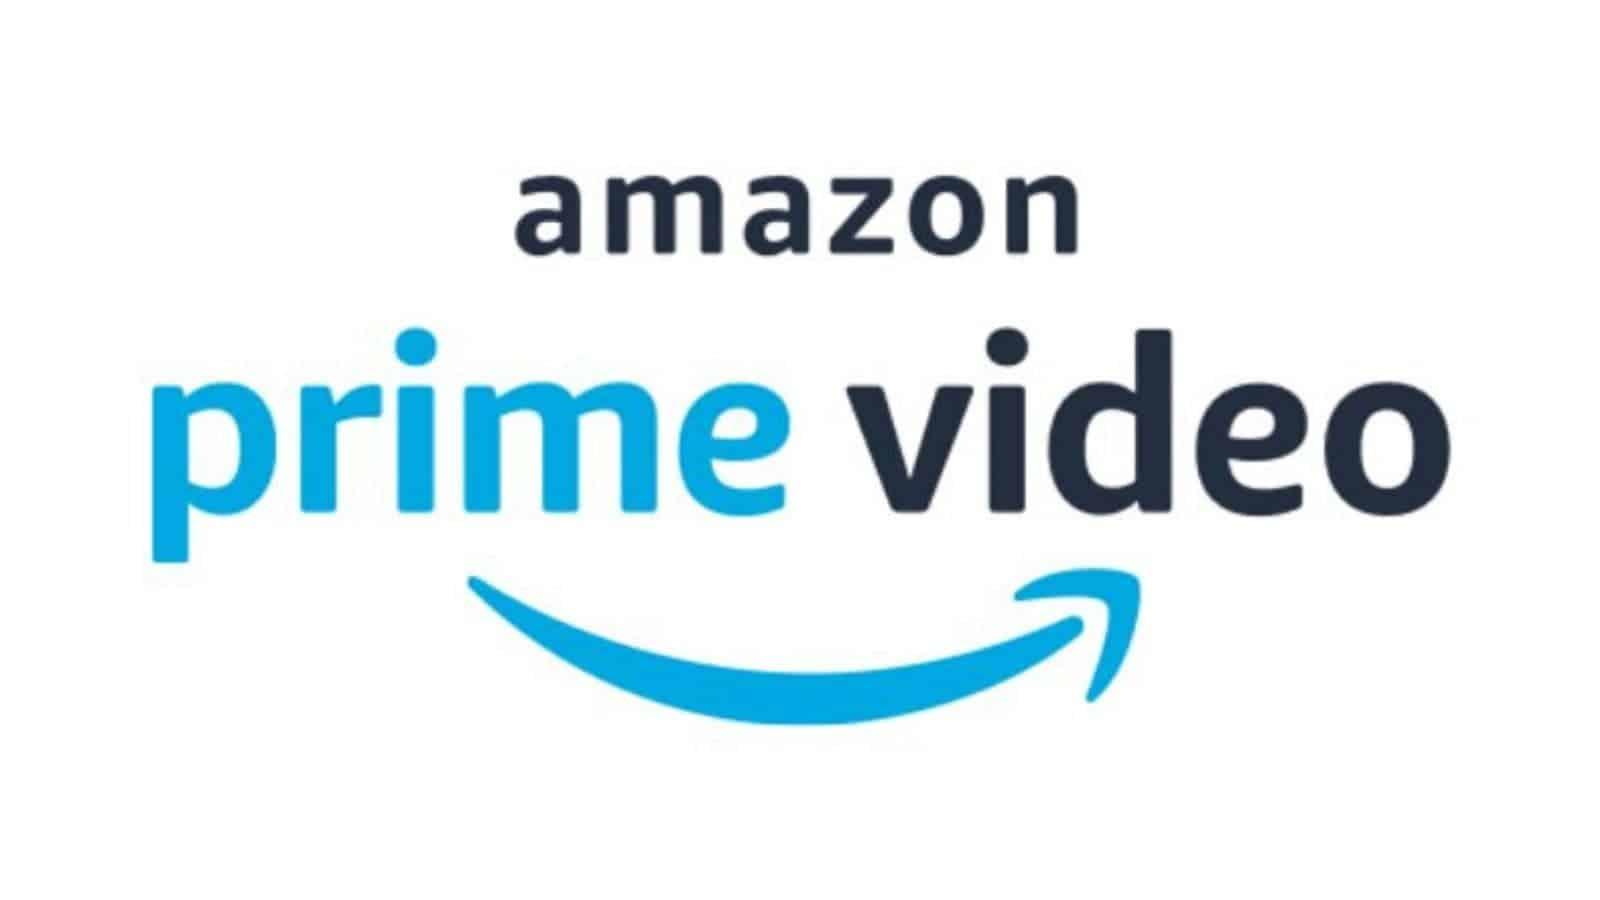 【Prime Video】3万本以上の映画やドラマが見放題